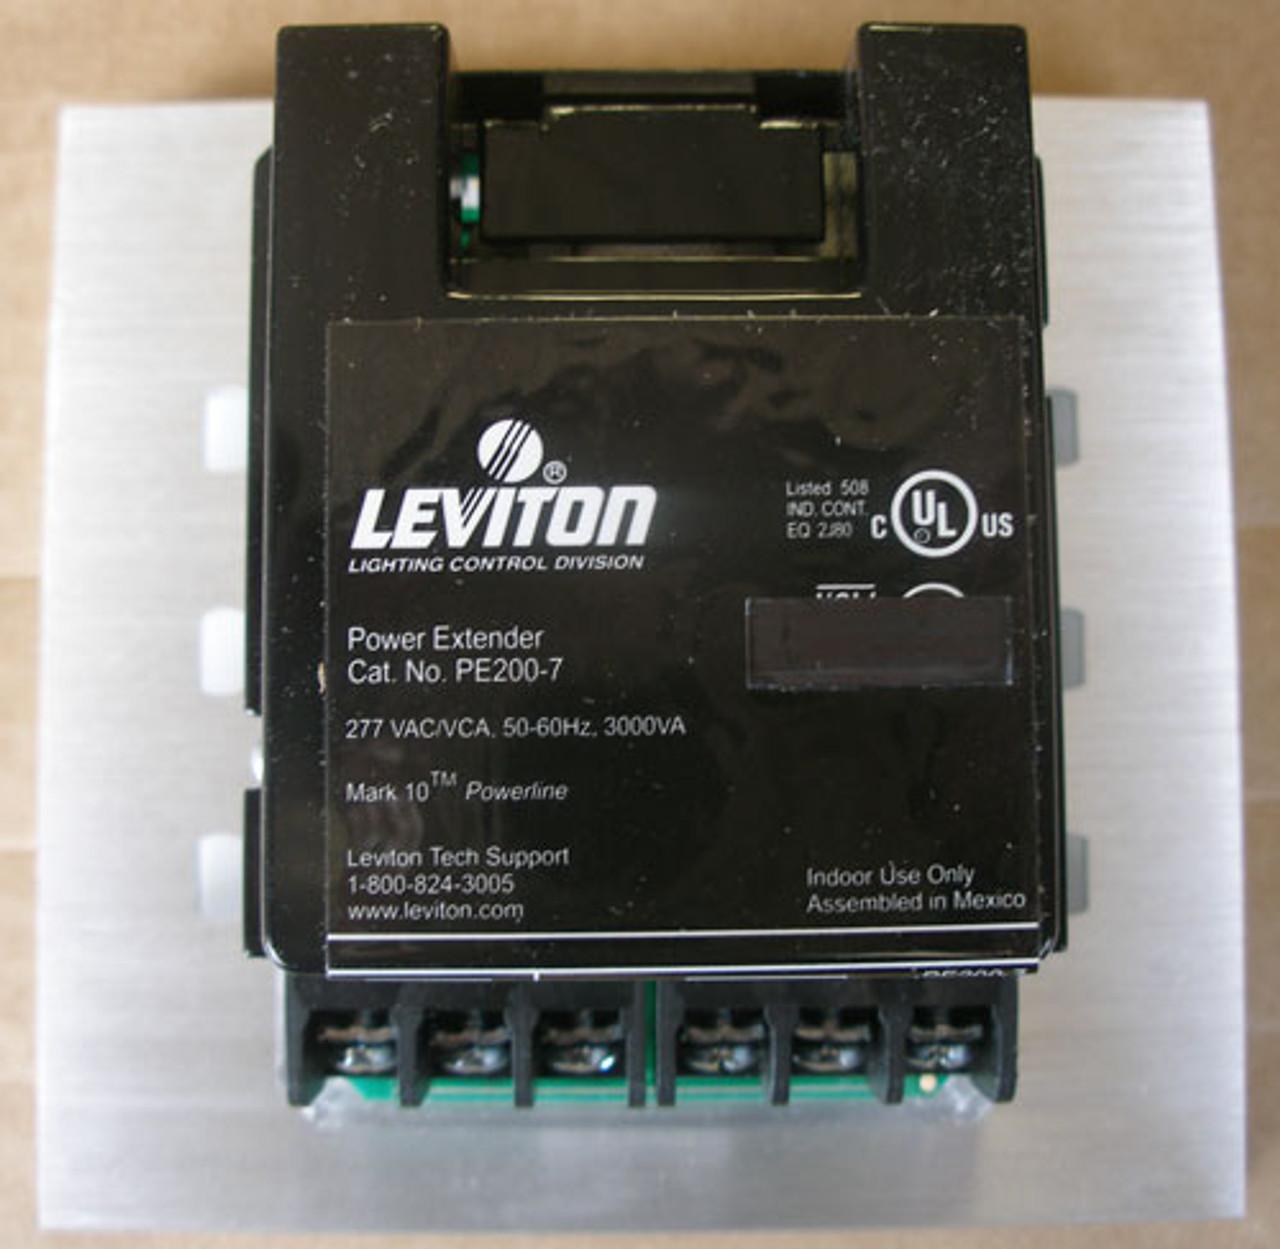 LEVITON POWER EXTENDER PE200-1 120VAC 50-60Hz